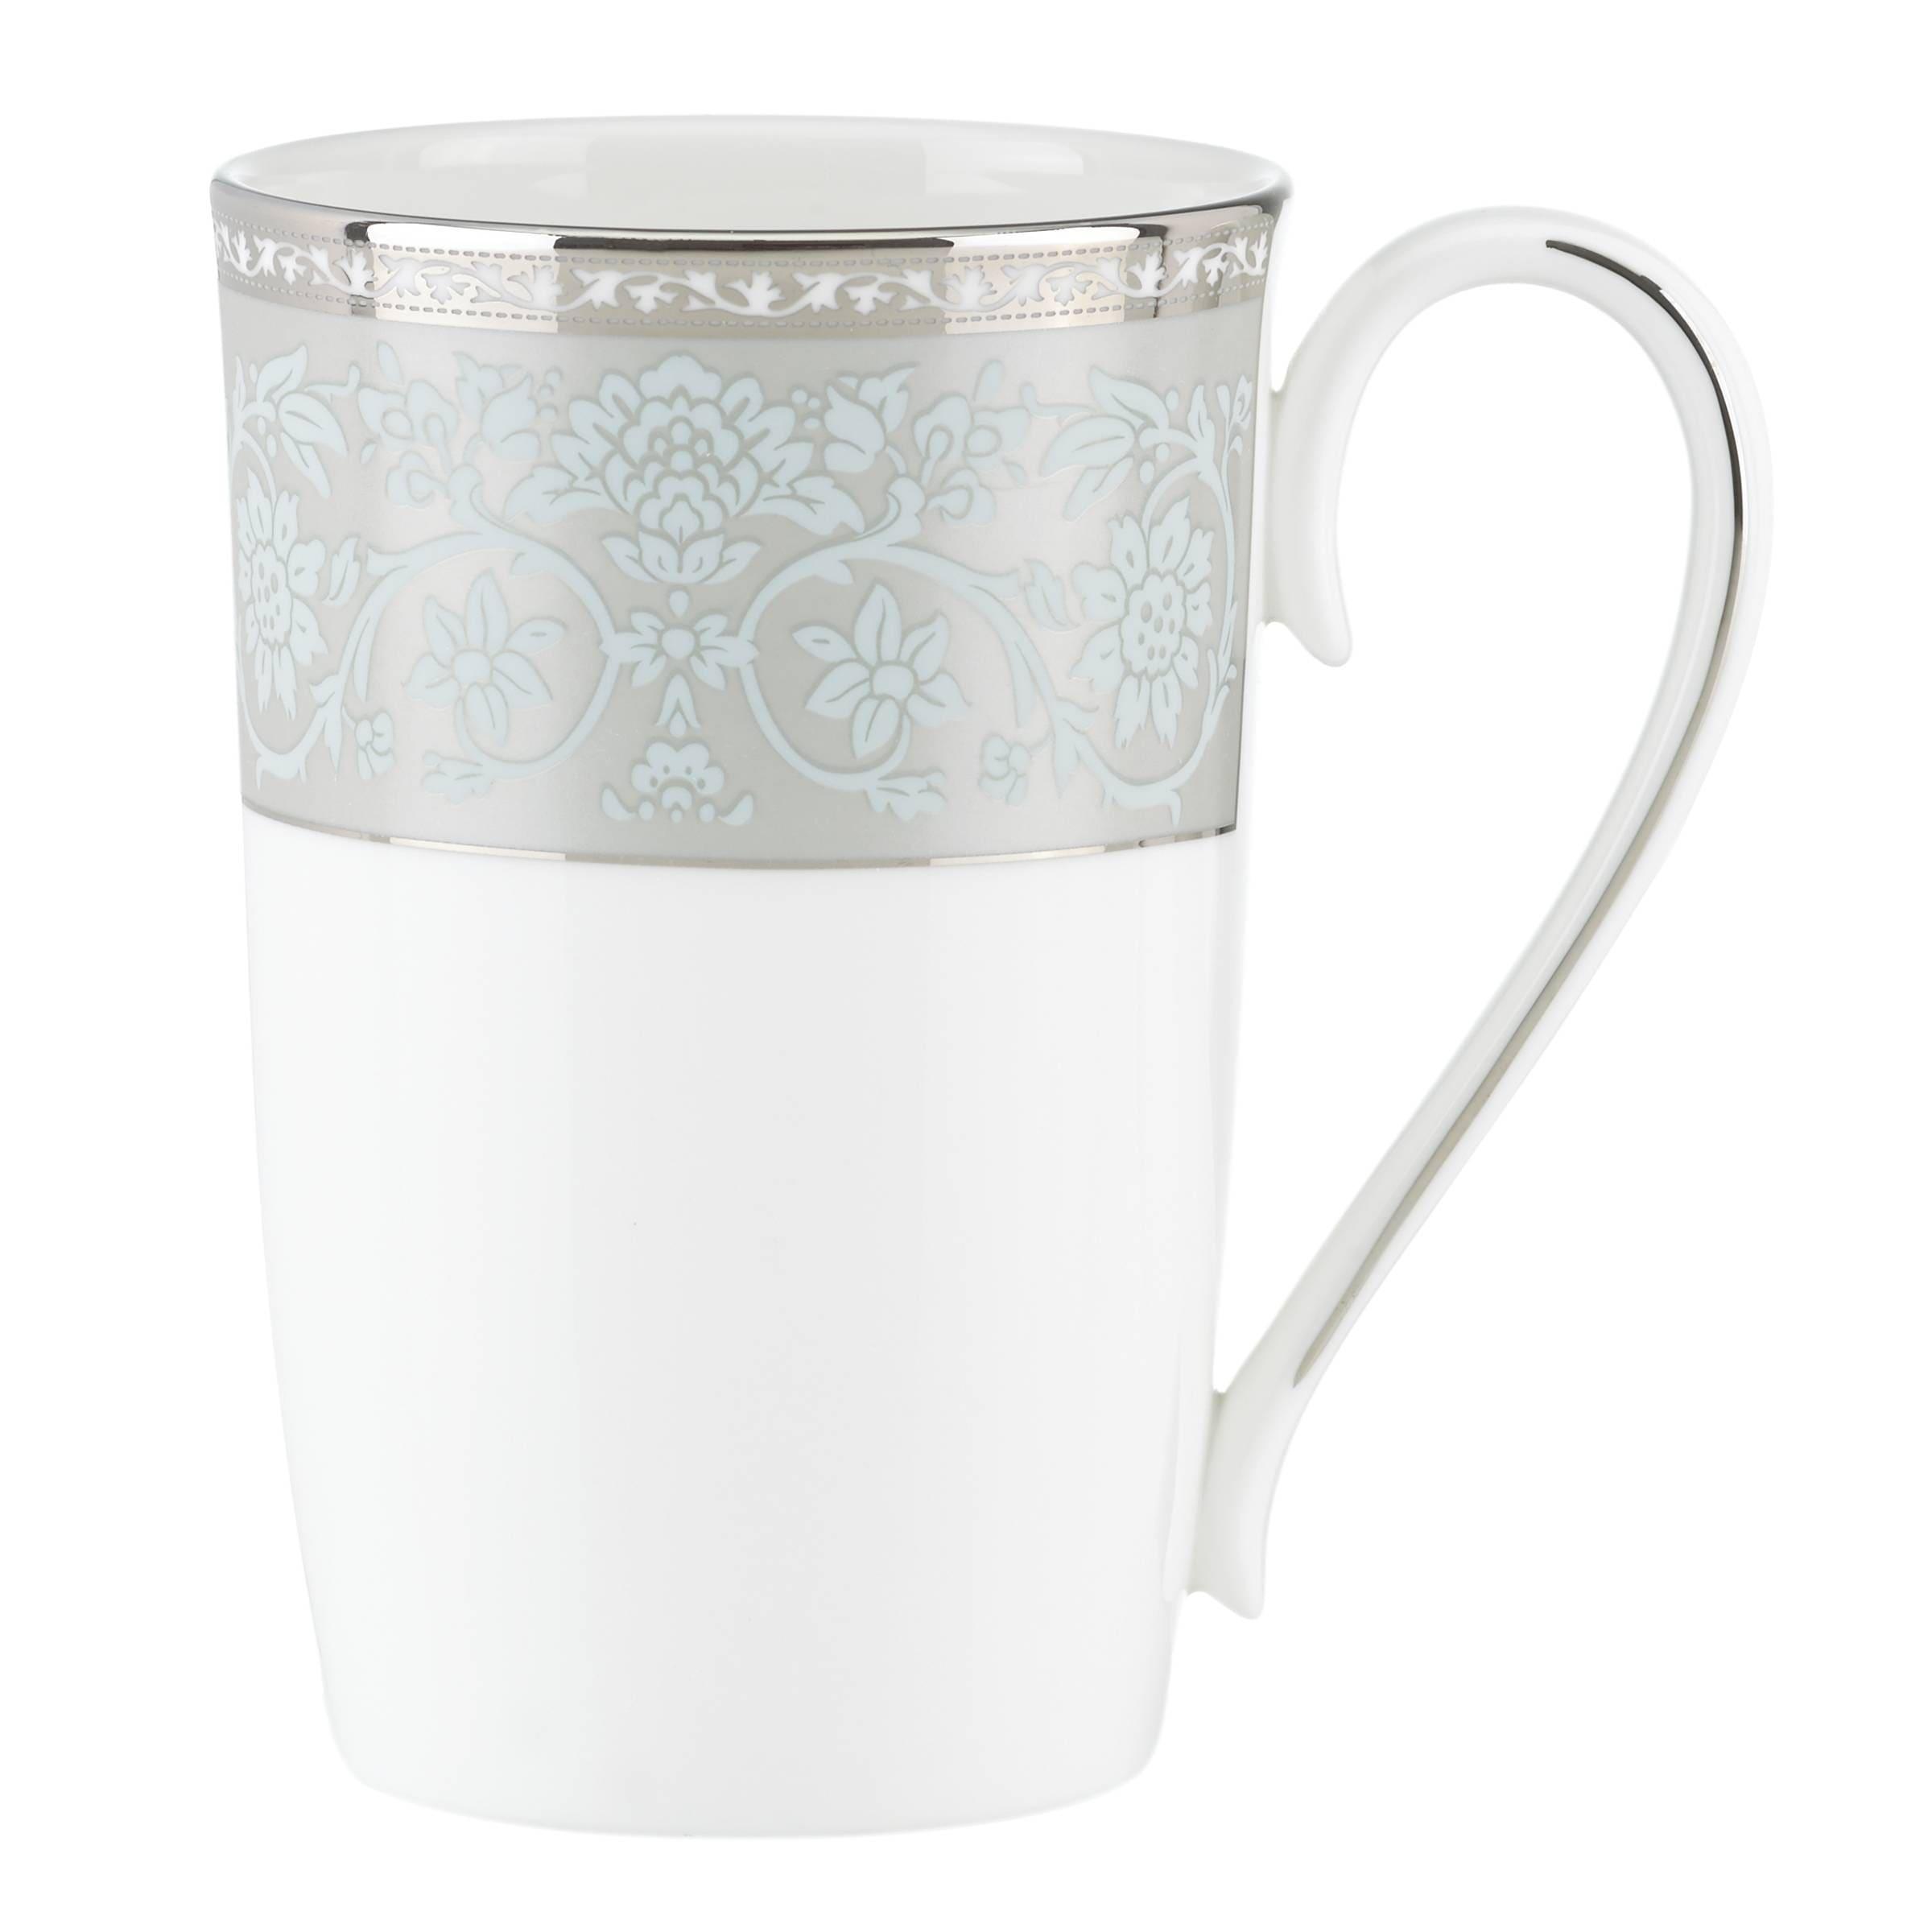 Westmore Tall Mug by Lenox Set of 4